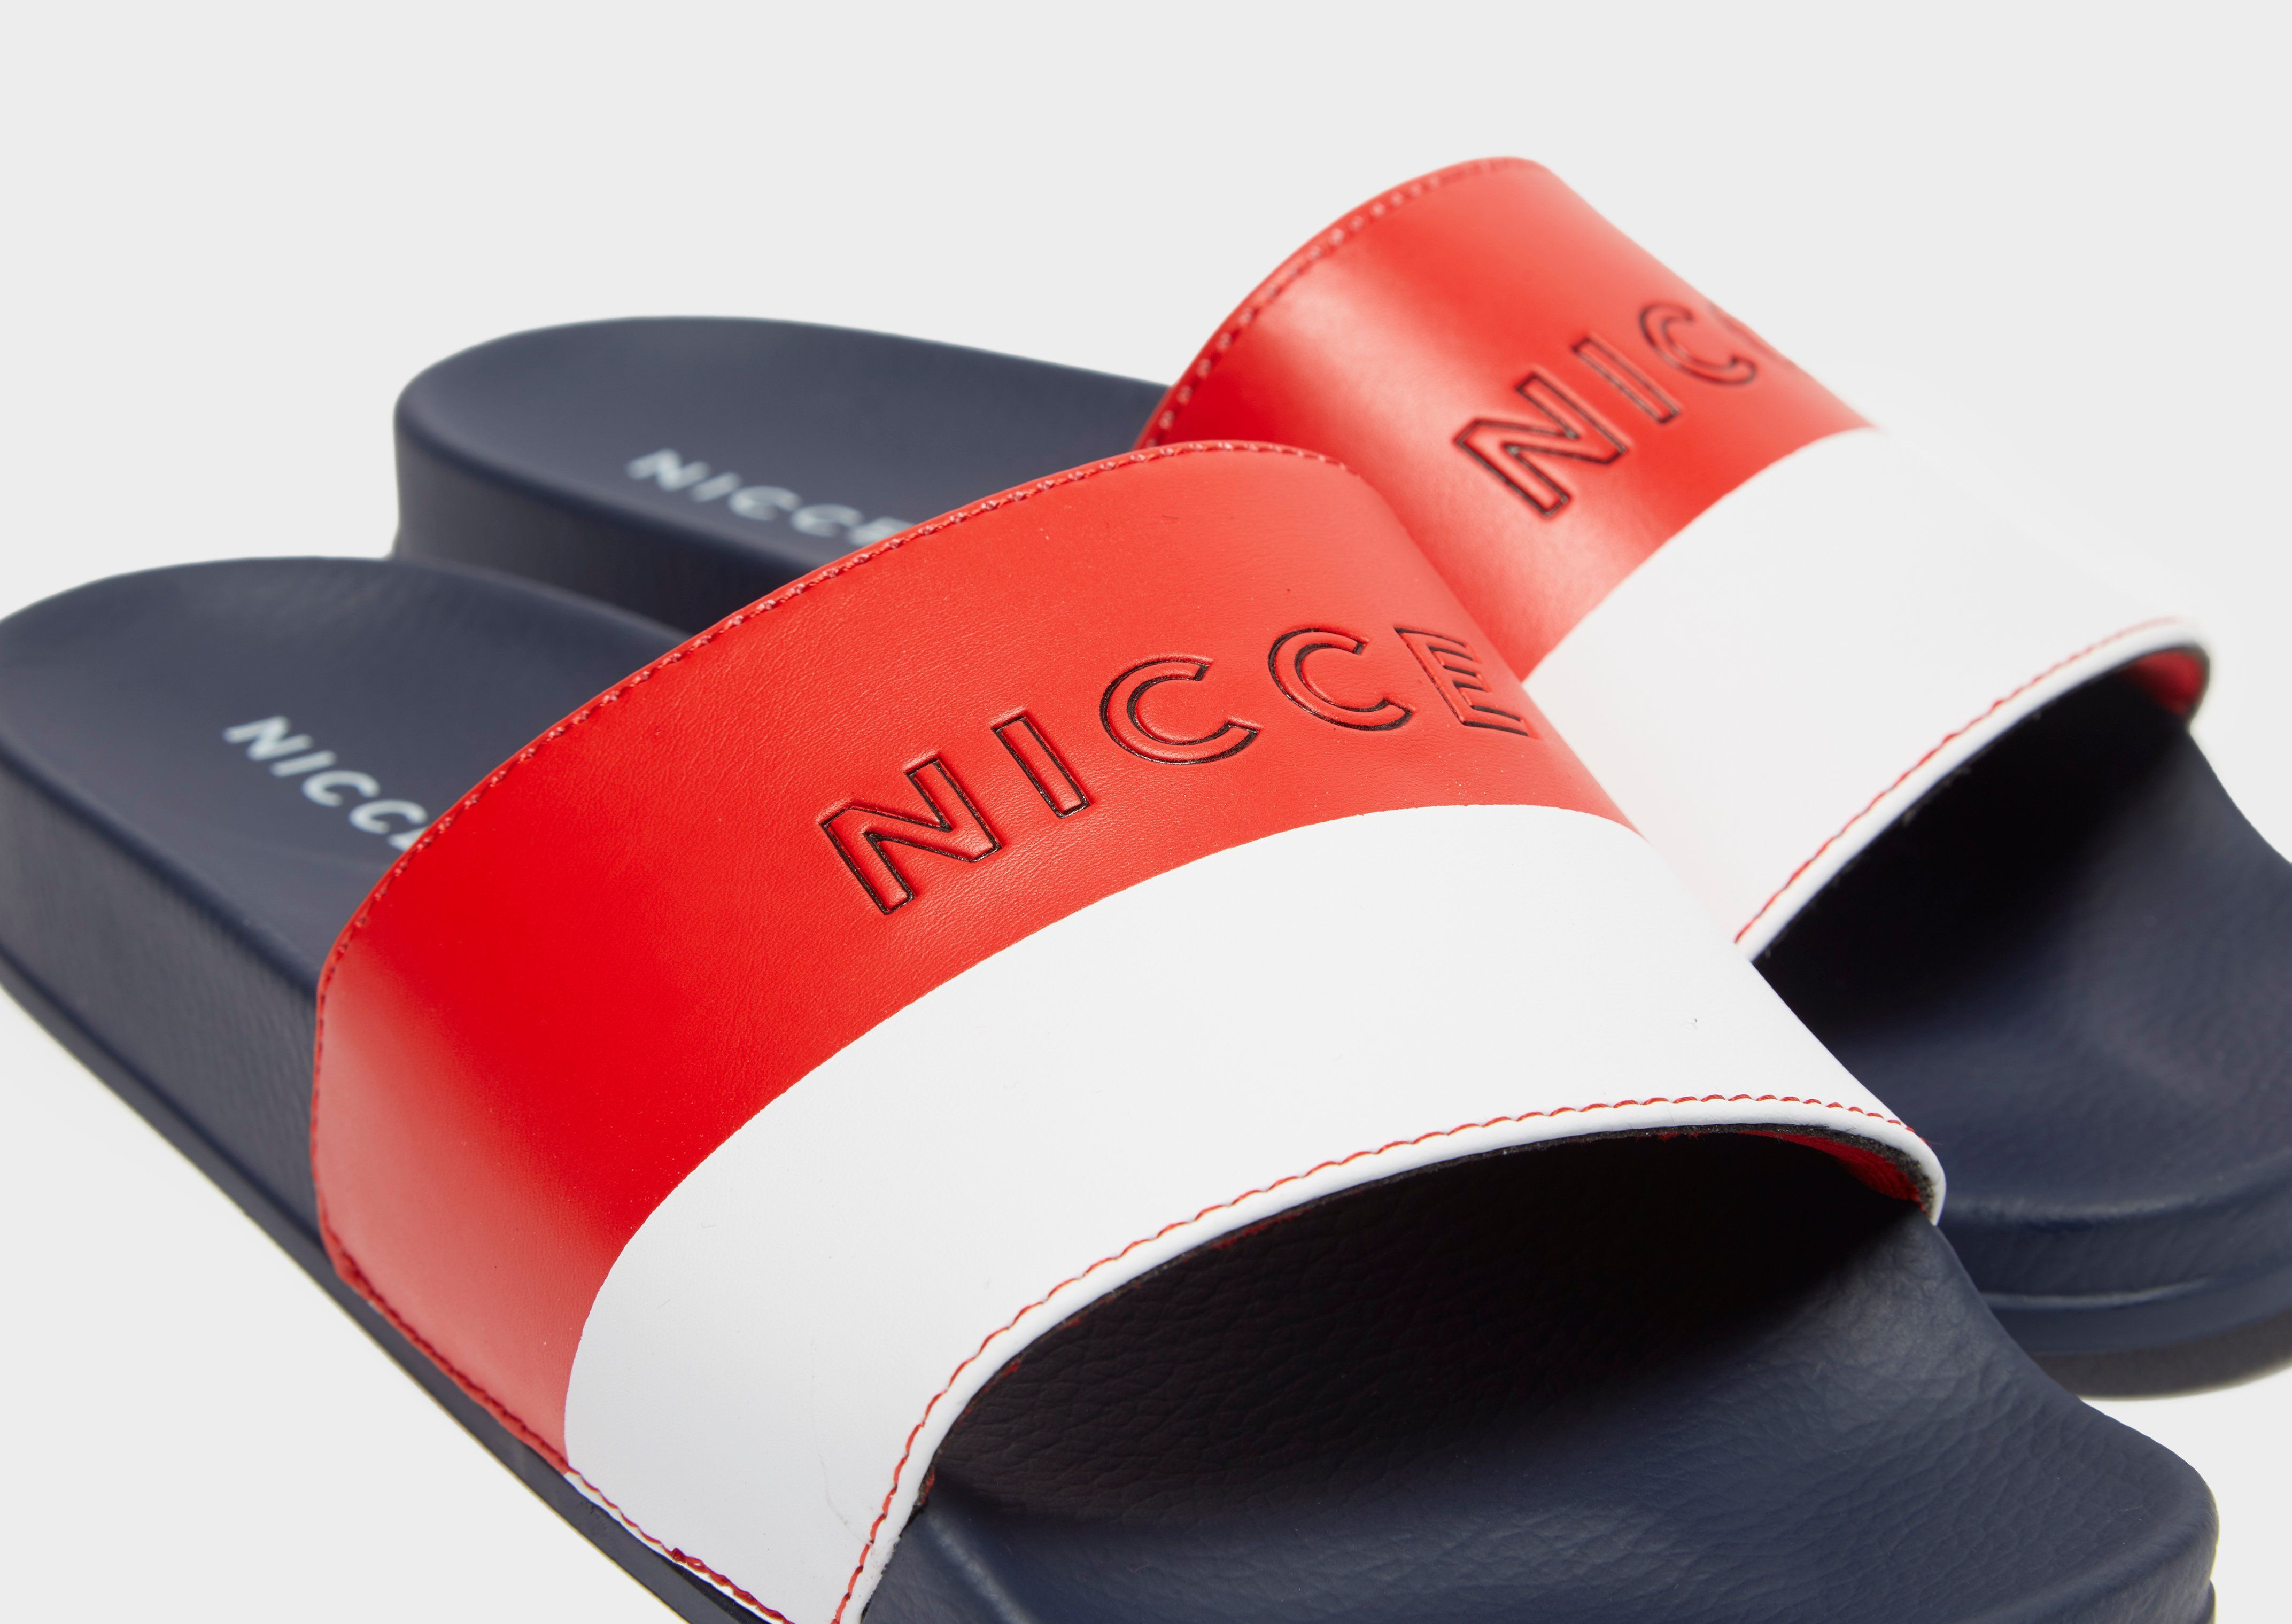 Nicce Core Slides